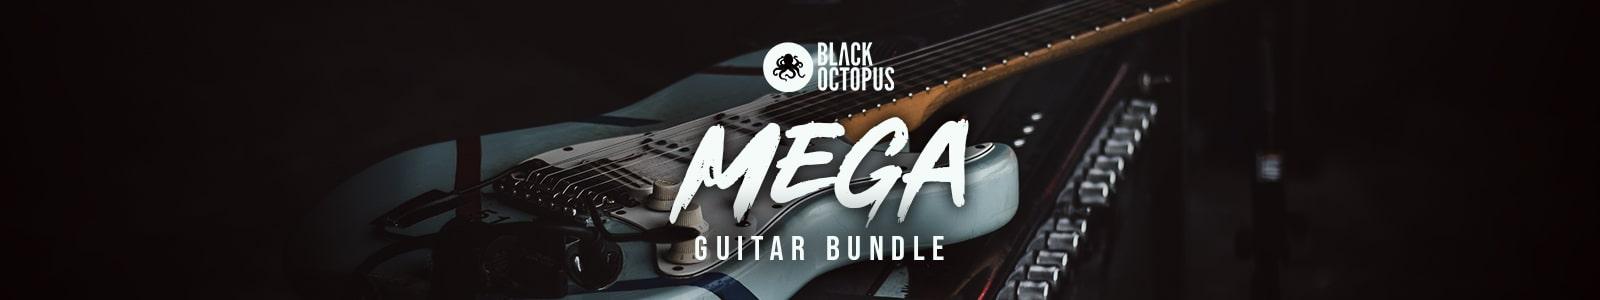 mega guitar bundle by black octopus